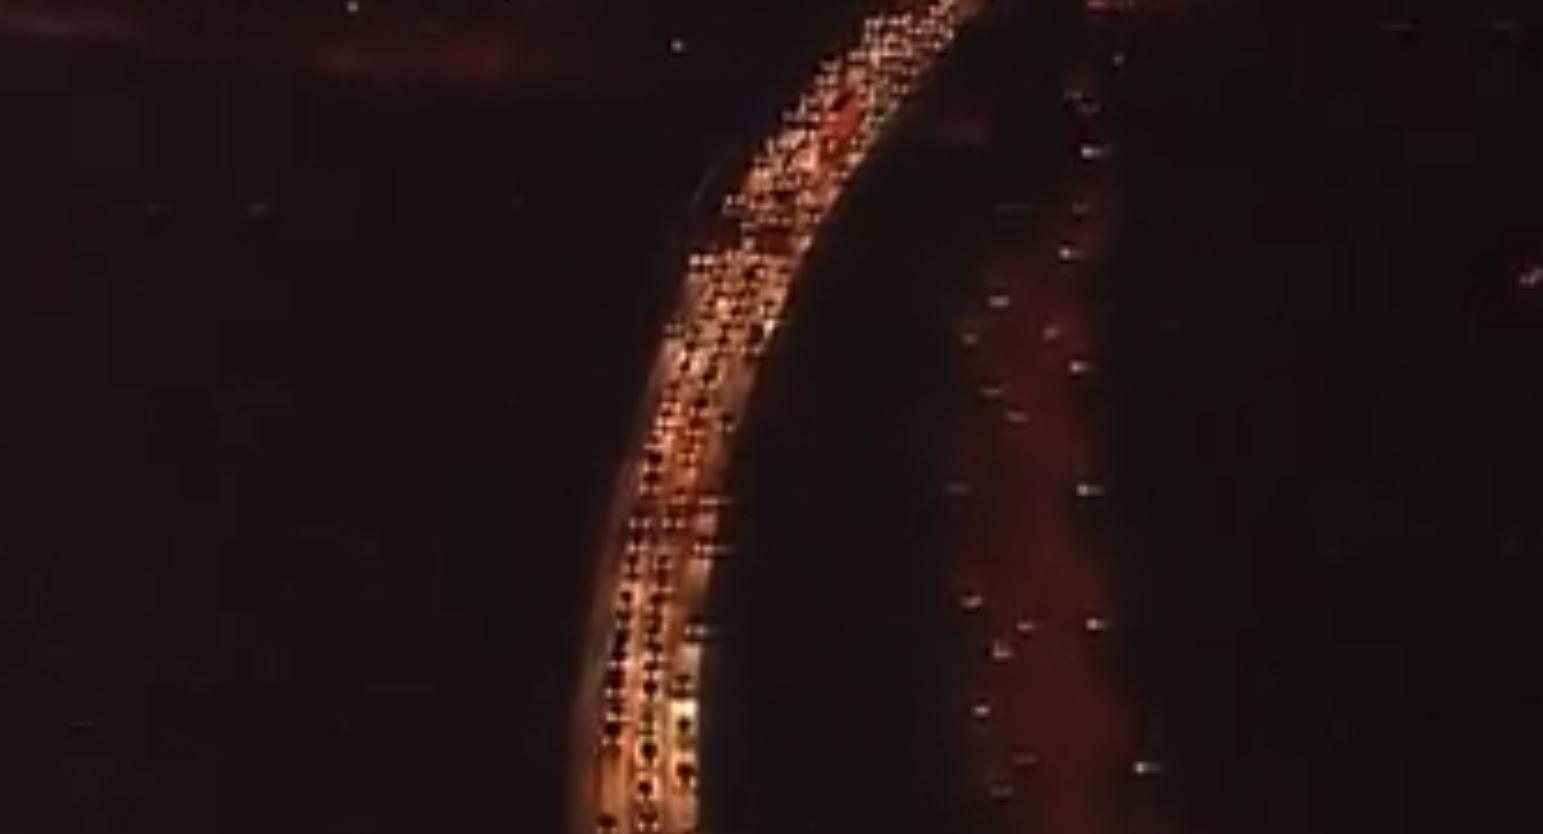 Crash causes traffic to back up on I-44 near I-40 in OKC